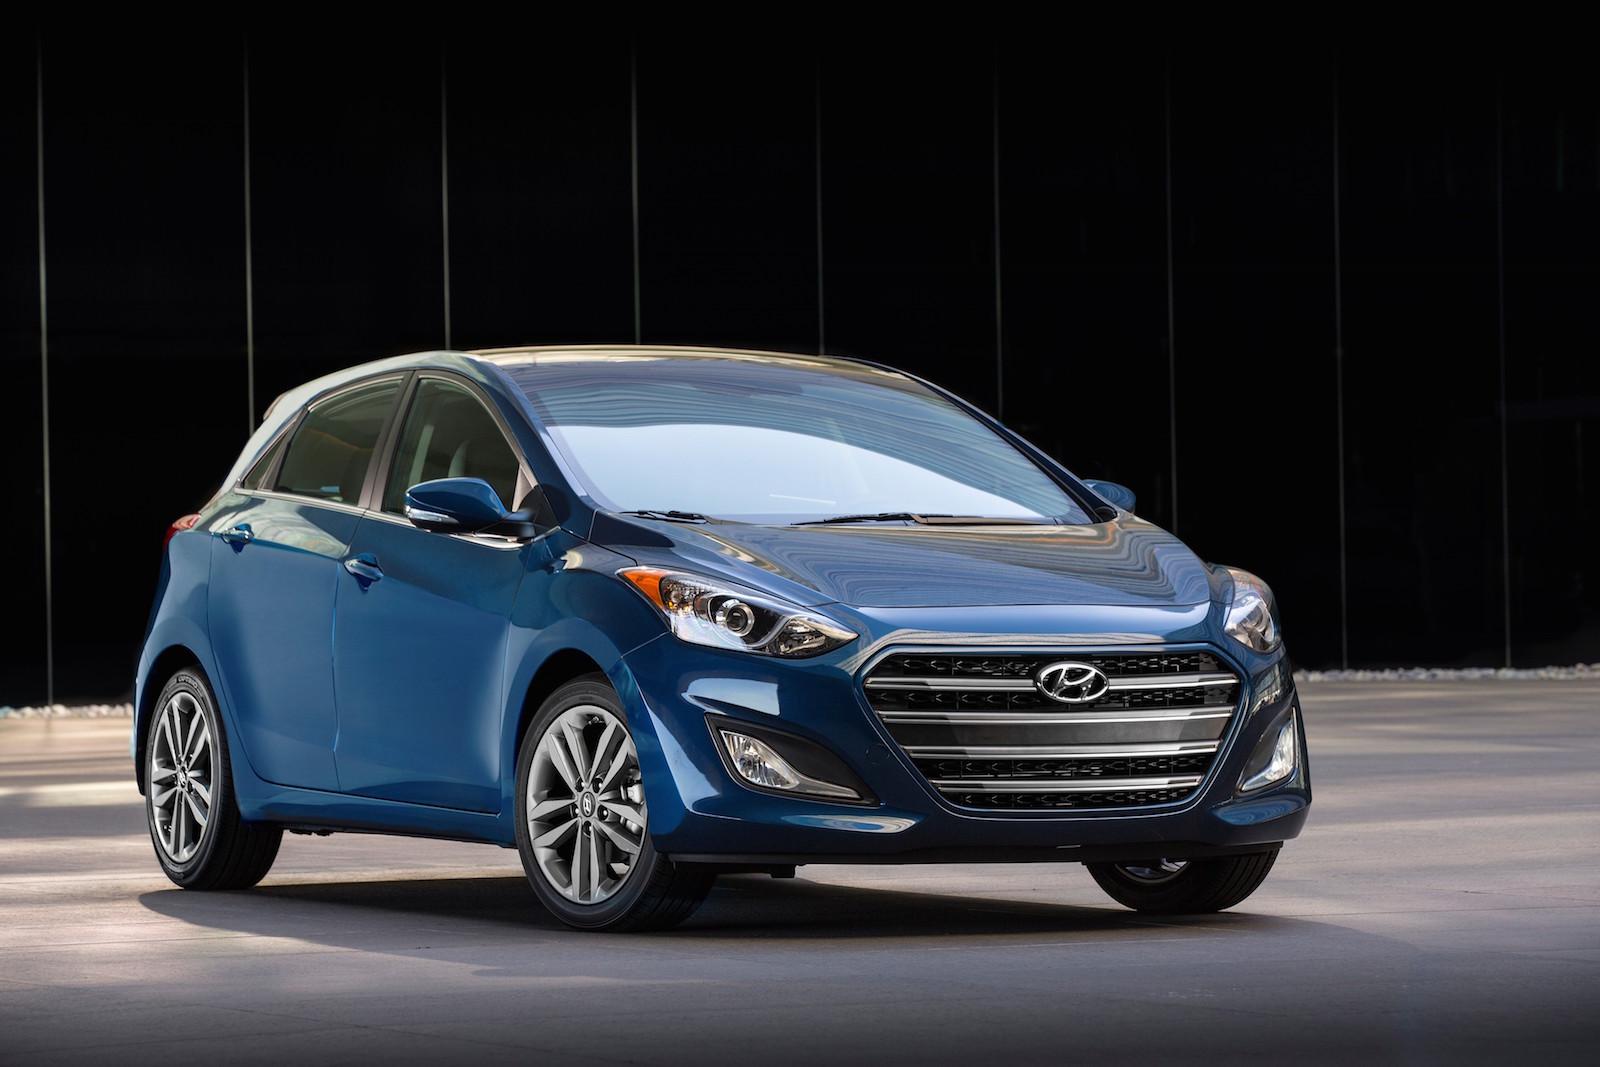 2016 Hyundai Elantra Review Ratings Specs Prices And